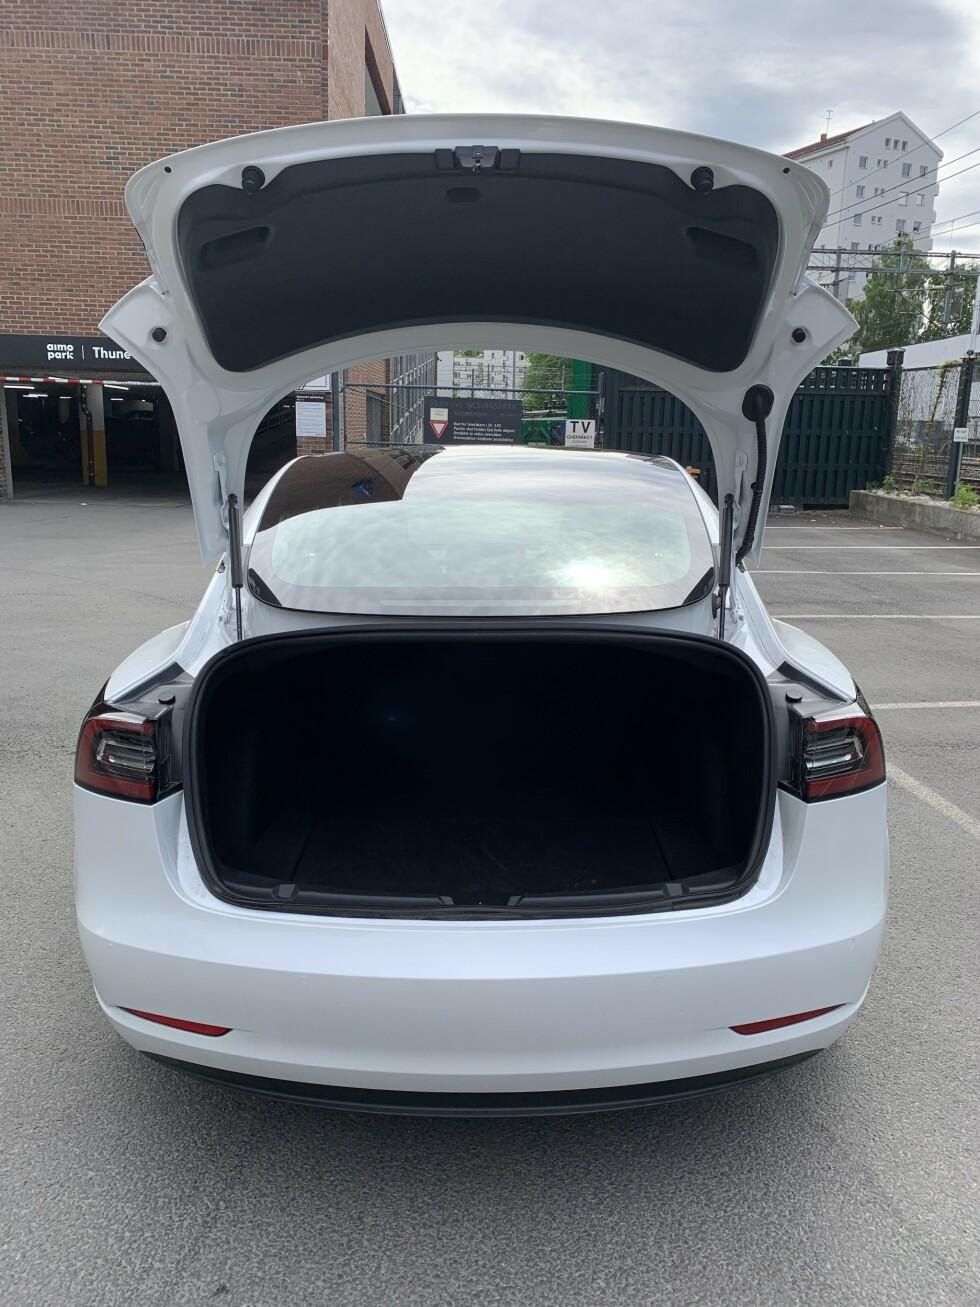 DYPT, MEN LAVT: Bagasjerommet på Tesla Model 3. Foto: Øystein B. Fossum